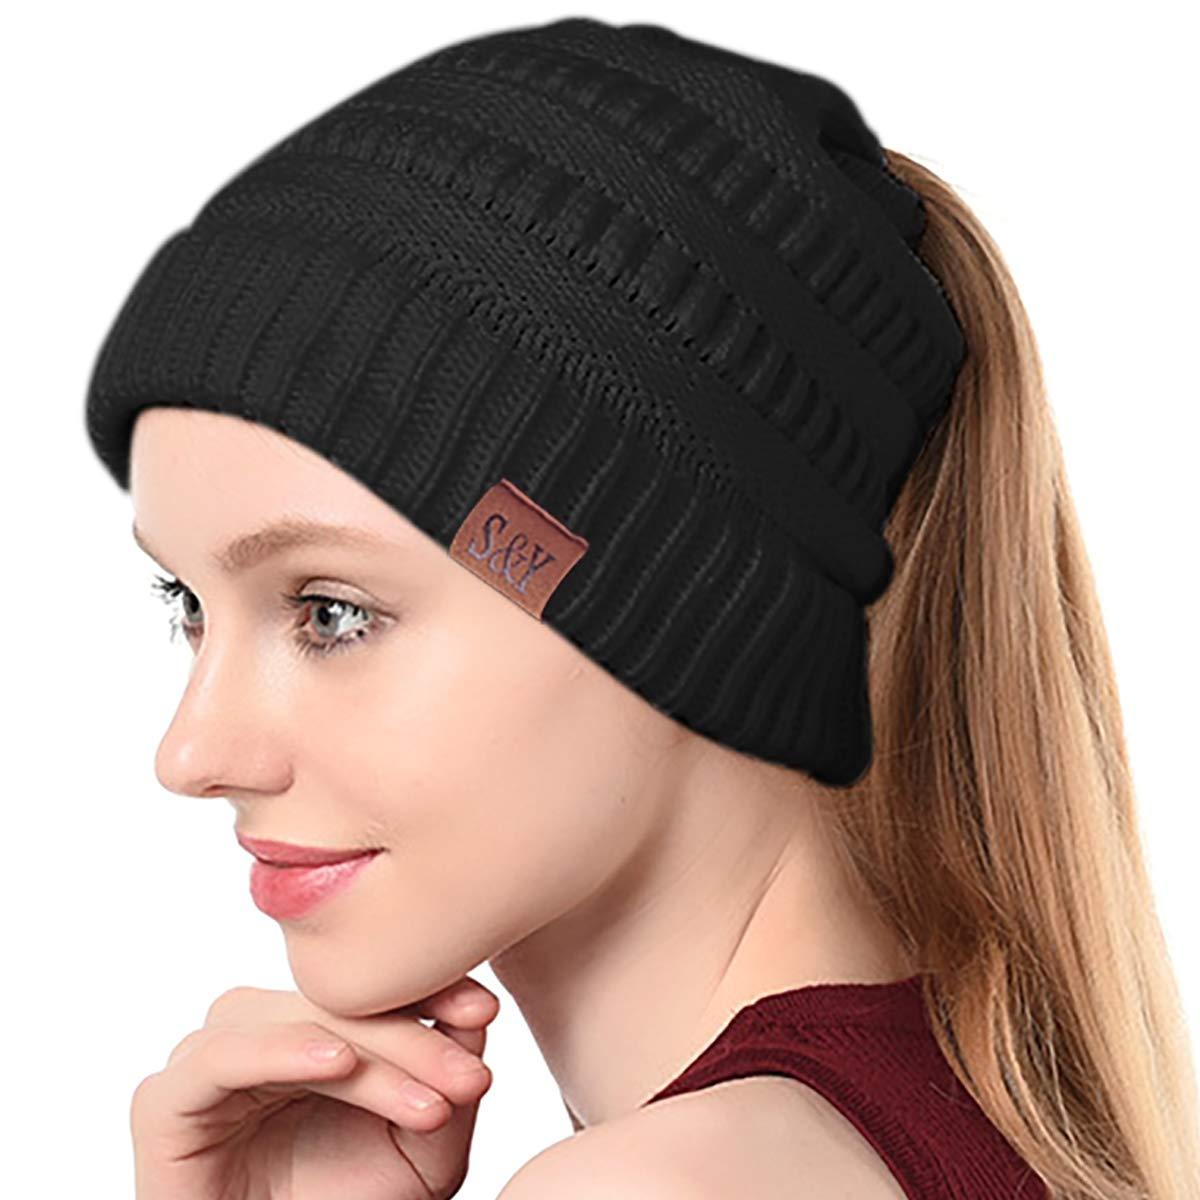 SIHOHAN Women Beanie Hat Trendy Knit Hats Soft Strech Cable Bun Ponytail Winter Hat